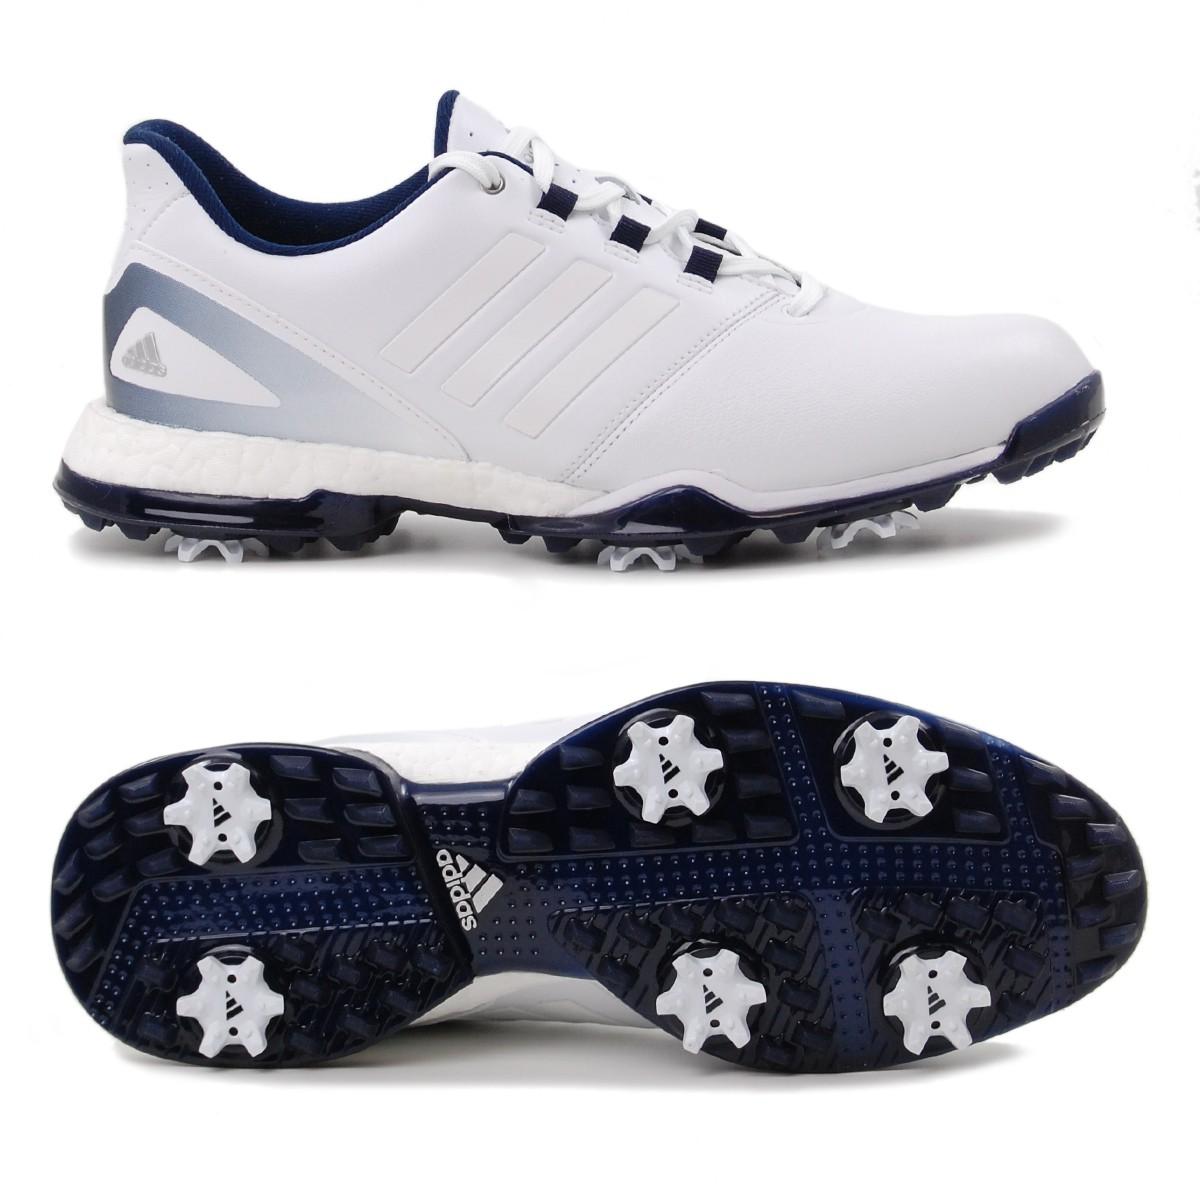 free shipping 971ed f471e Adidas adipower Boost 3 Damen Golfschuhe, Weiß  Dunkelblau günstig kaufen   Golflädchen